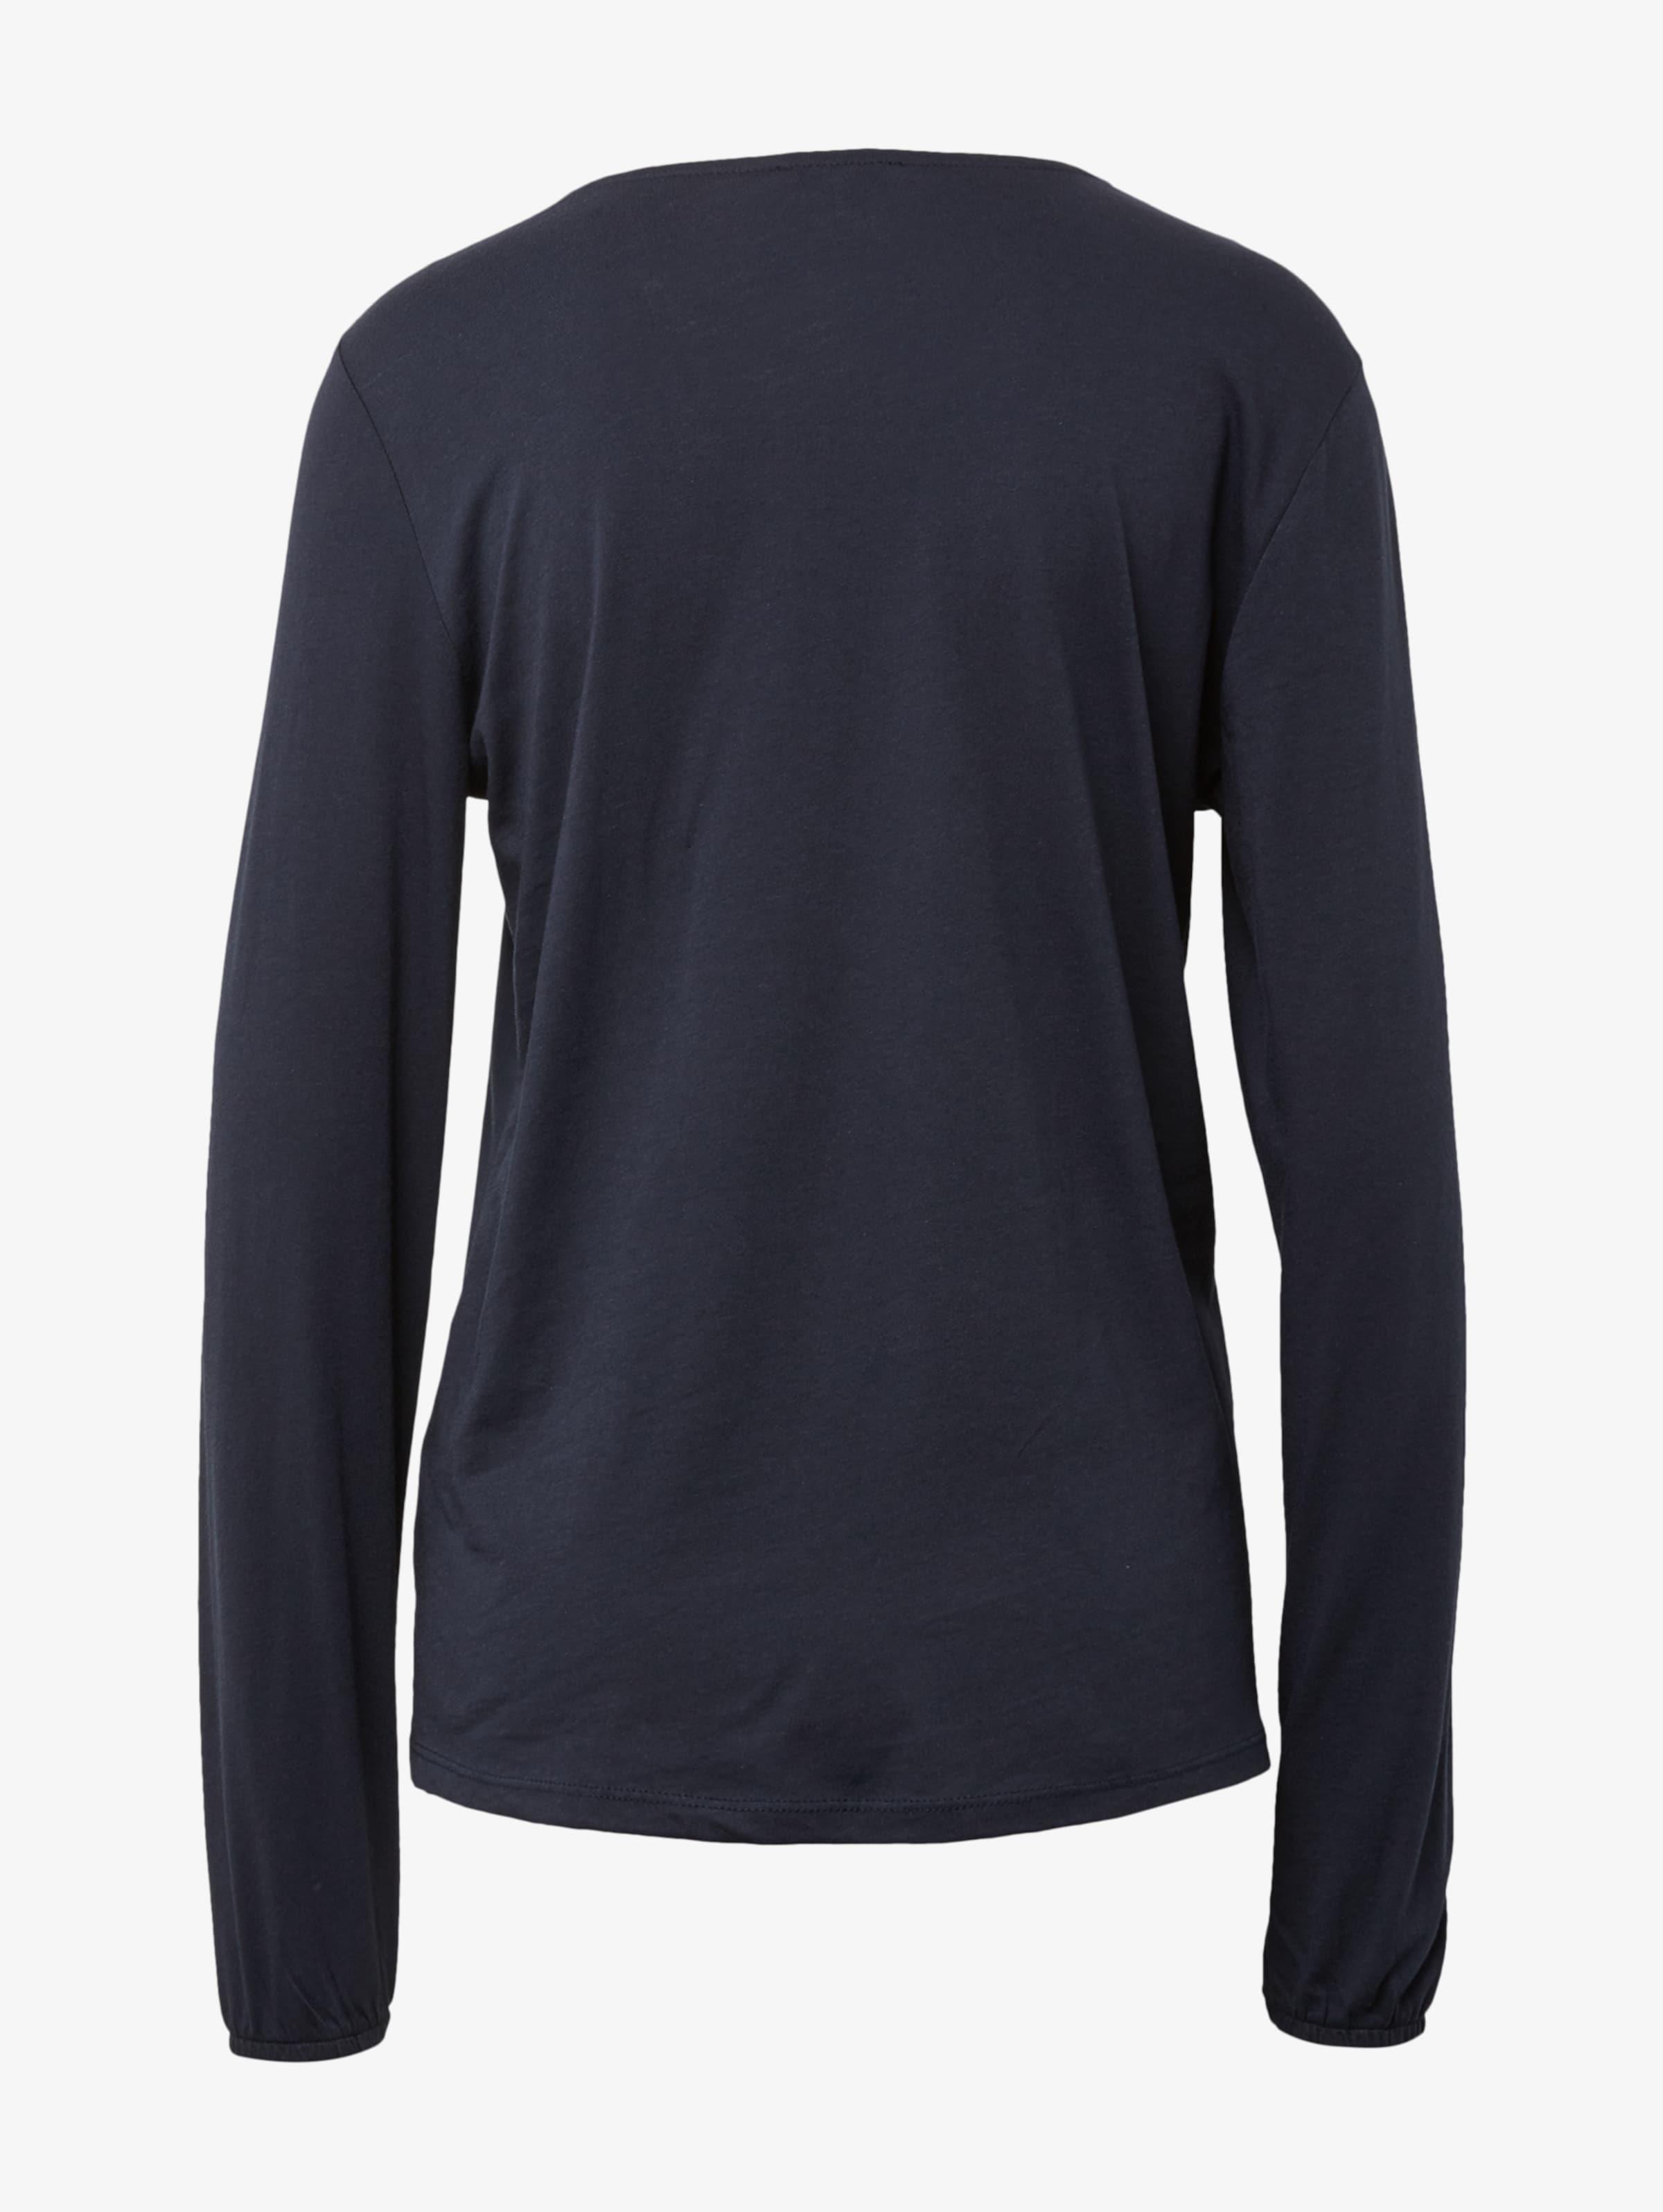 In T shirt Nachtblau Tailor Tom q354ARLj